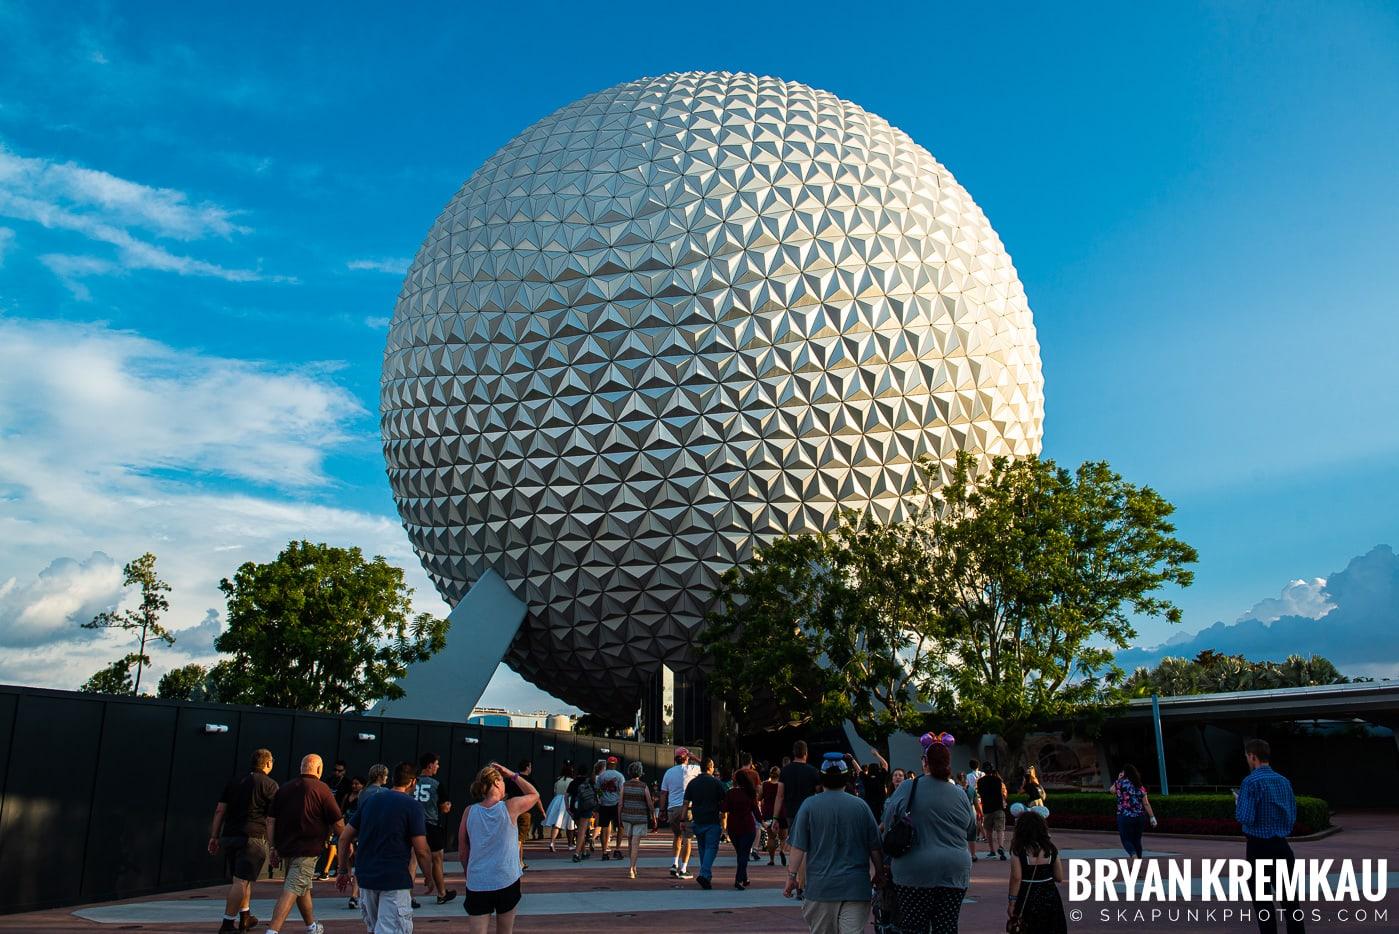 Walt Disney World Vacation: Days 1 & 2 (Disney Springs & Magic Kingdom, Epcot) September 29th - 30th 2019 (3)